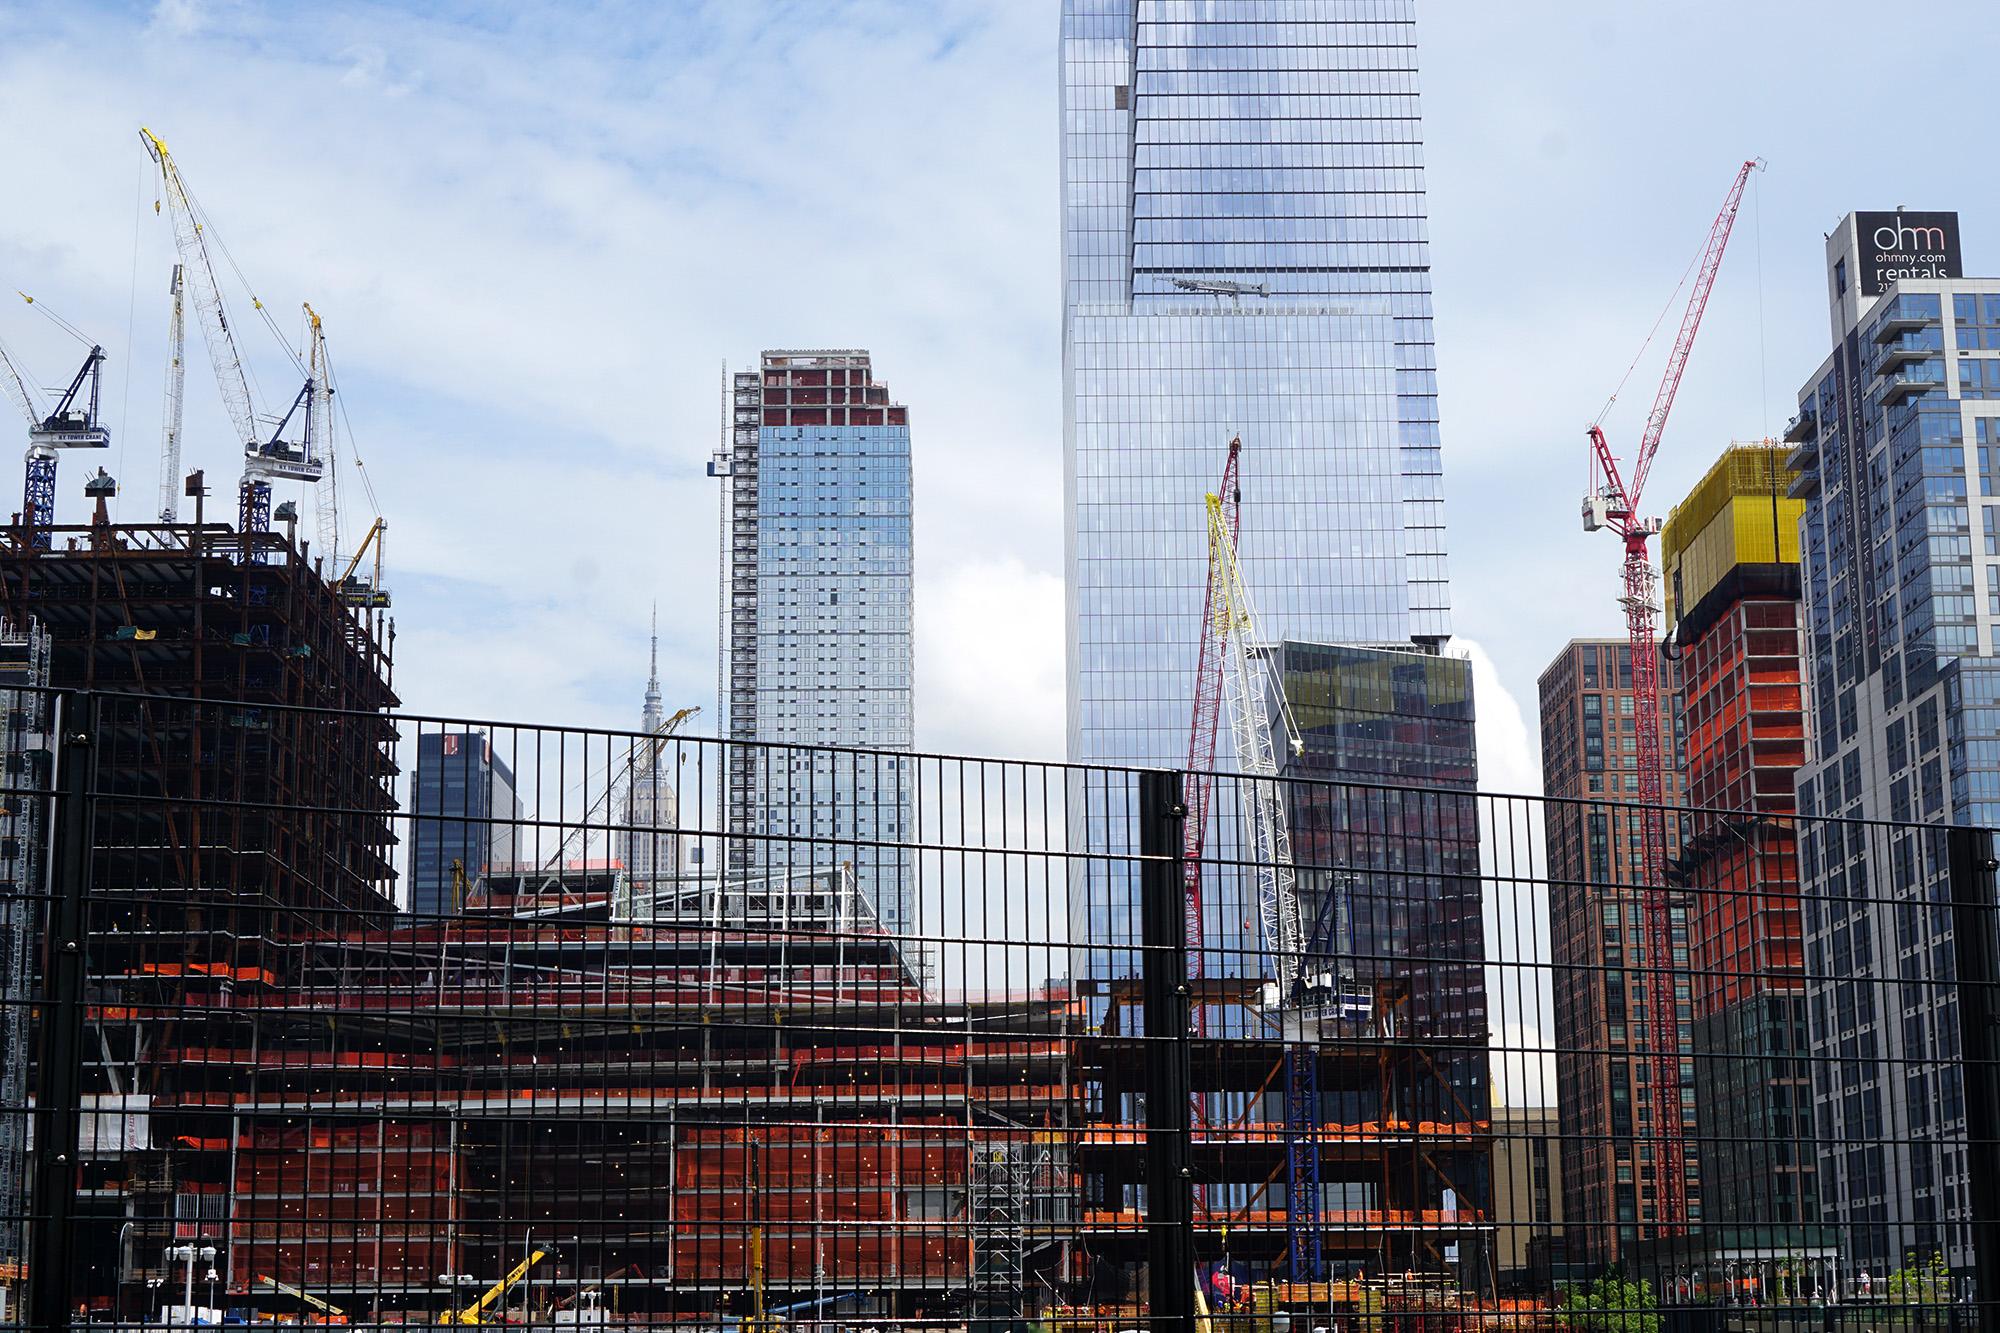 The High Line, New York City / Darker than Green